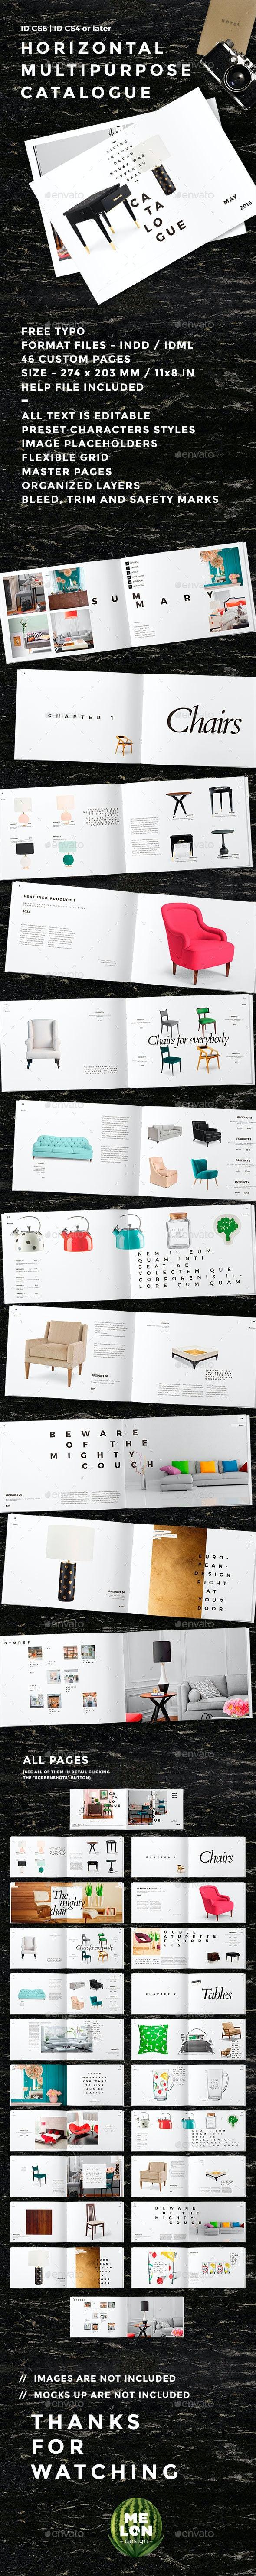 Horizontal Multipurpose Catalogue - Catalogs Brochures